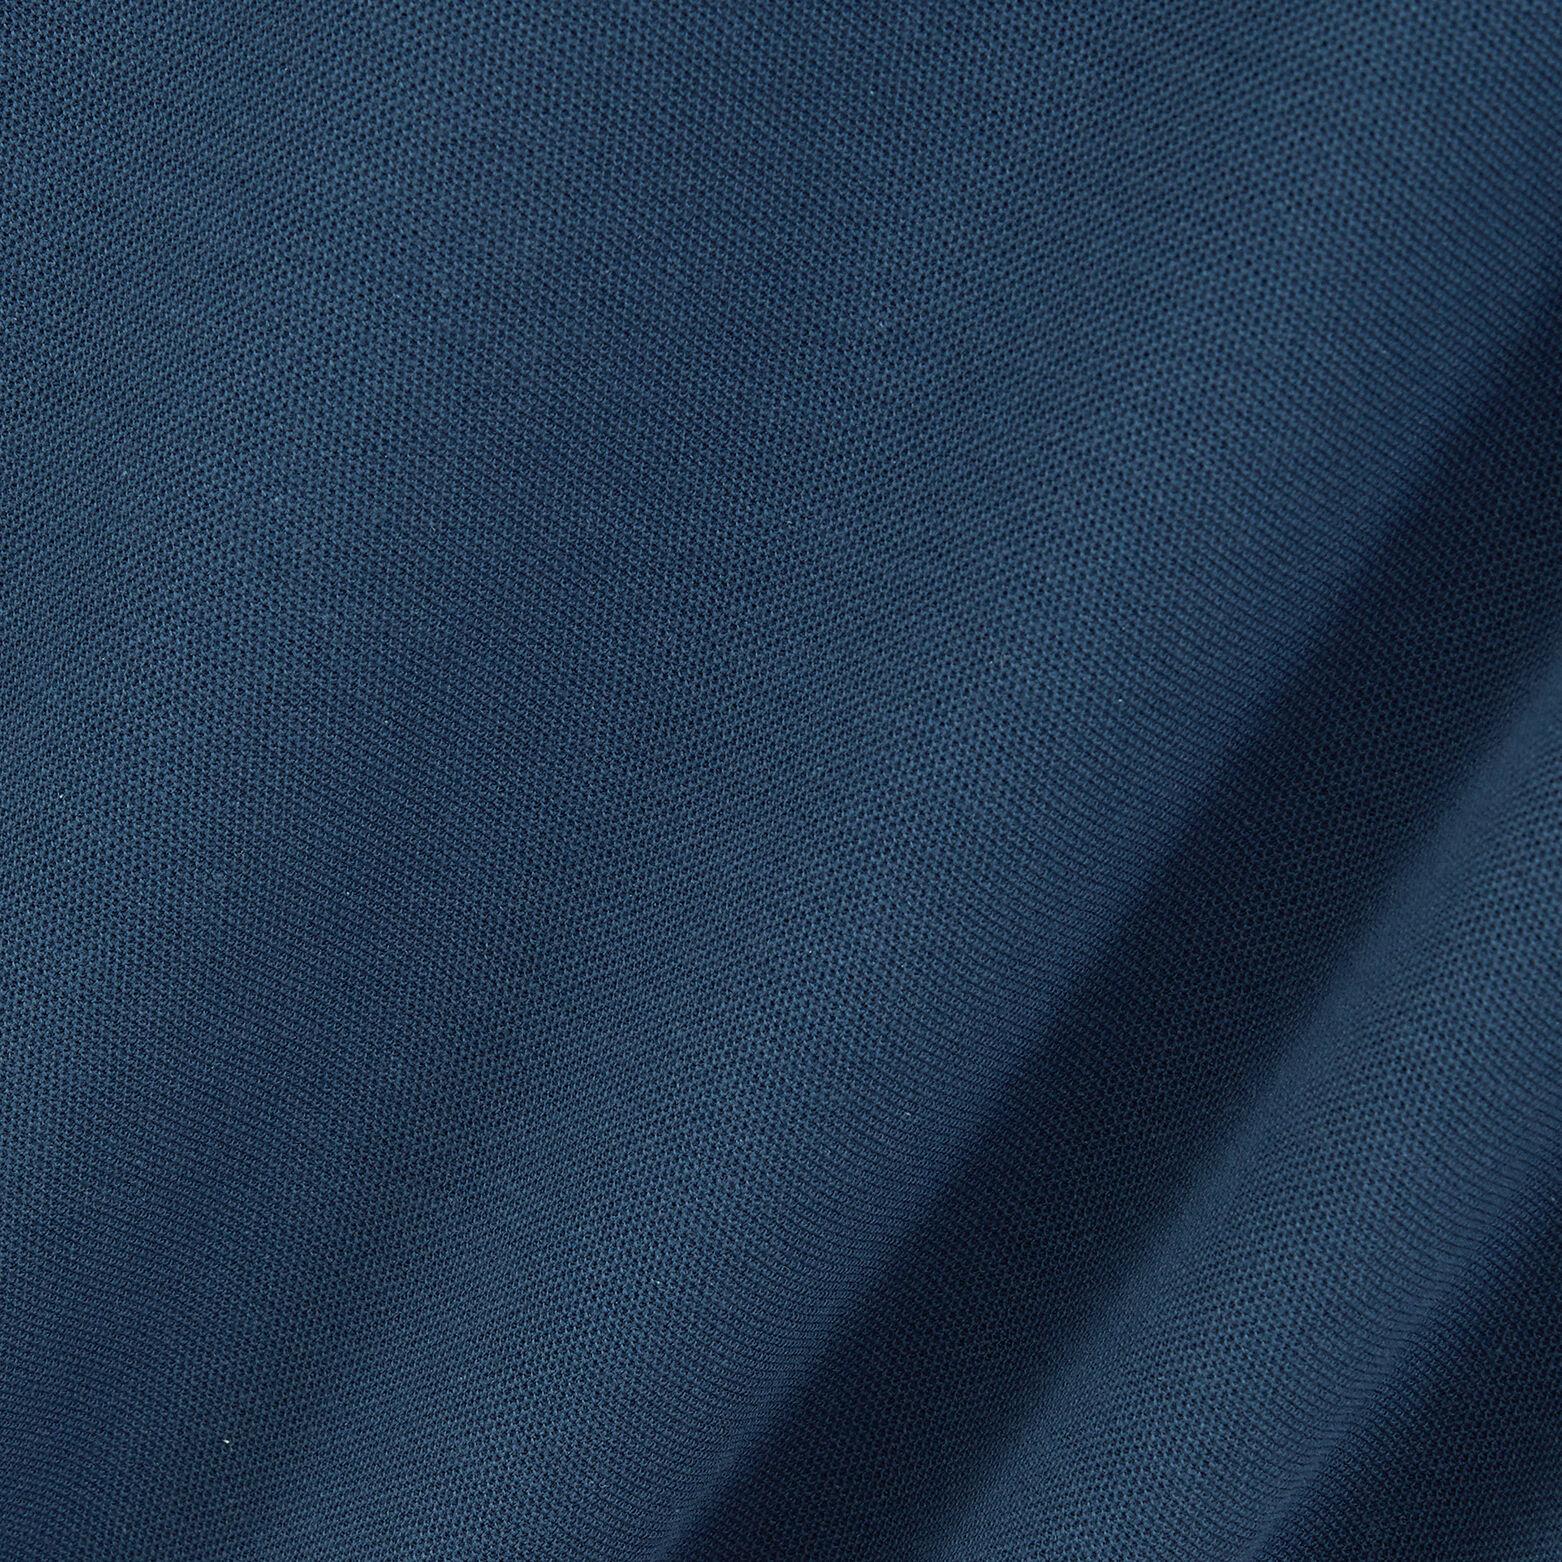 Polo manches courtes brodé en coton biologique